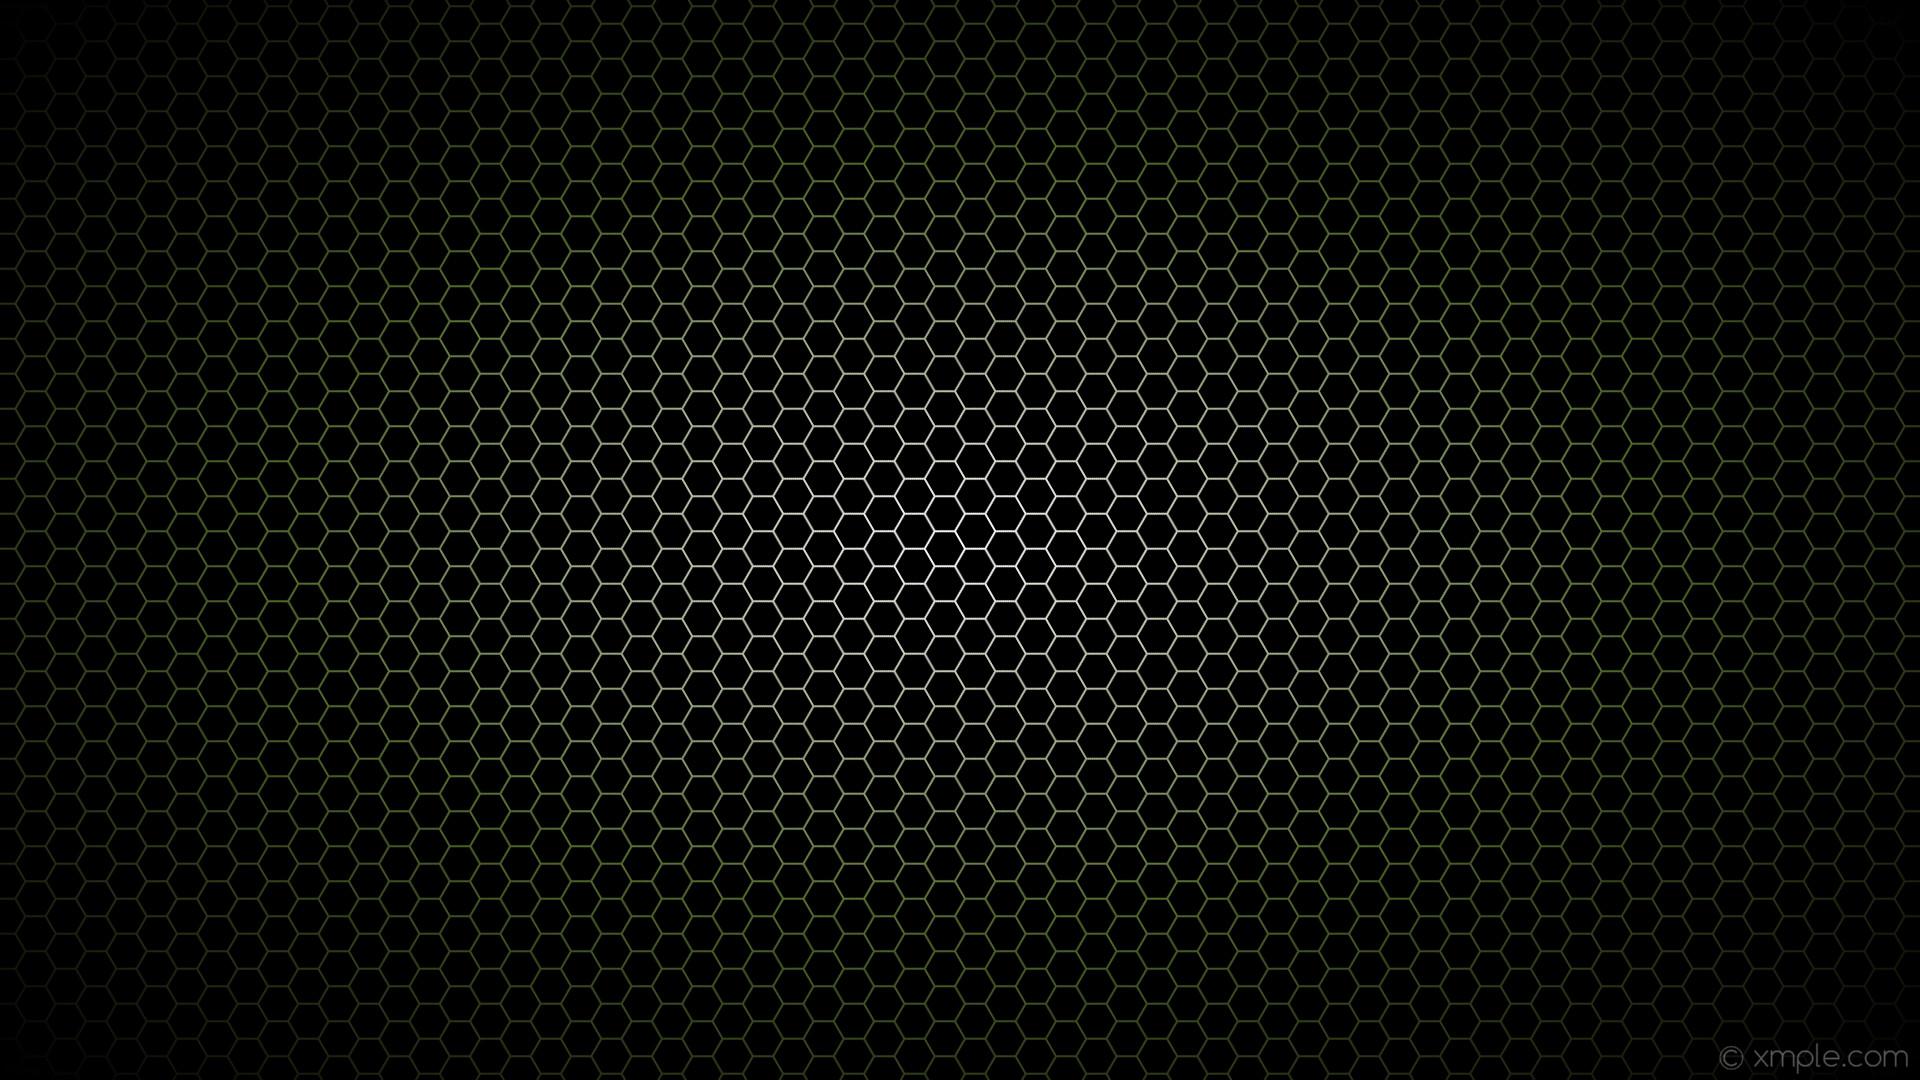 Black and green wallpaper 1920x1080